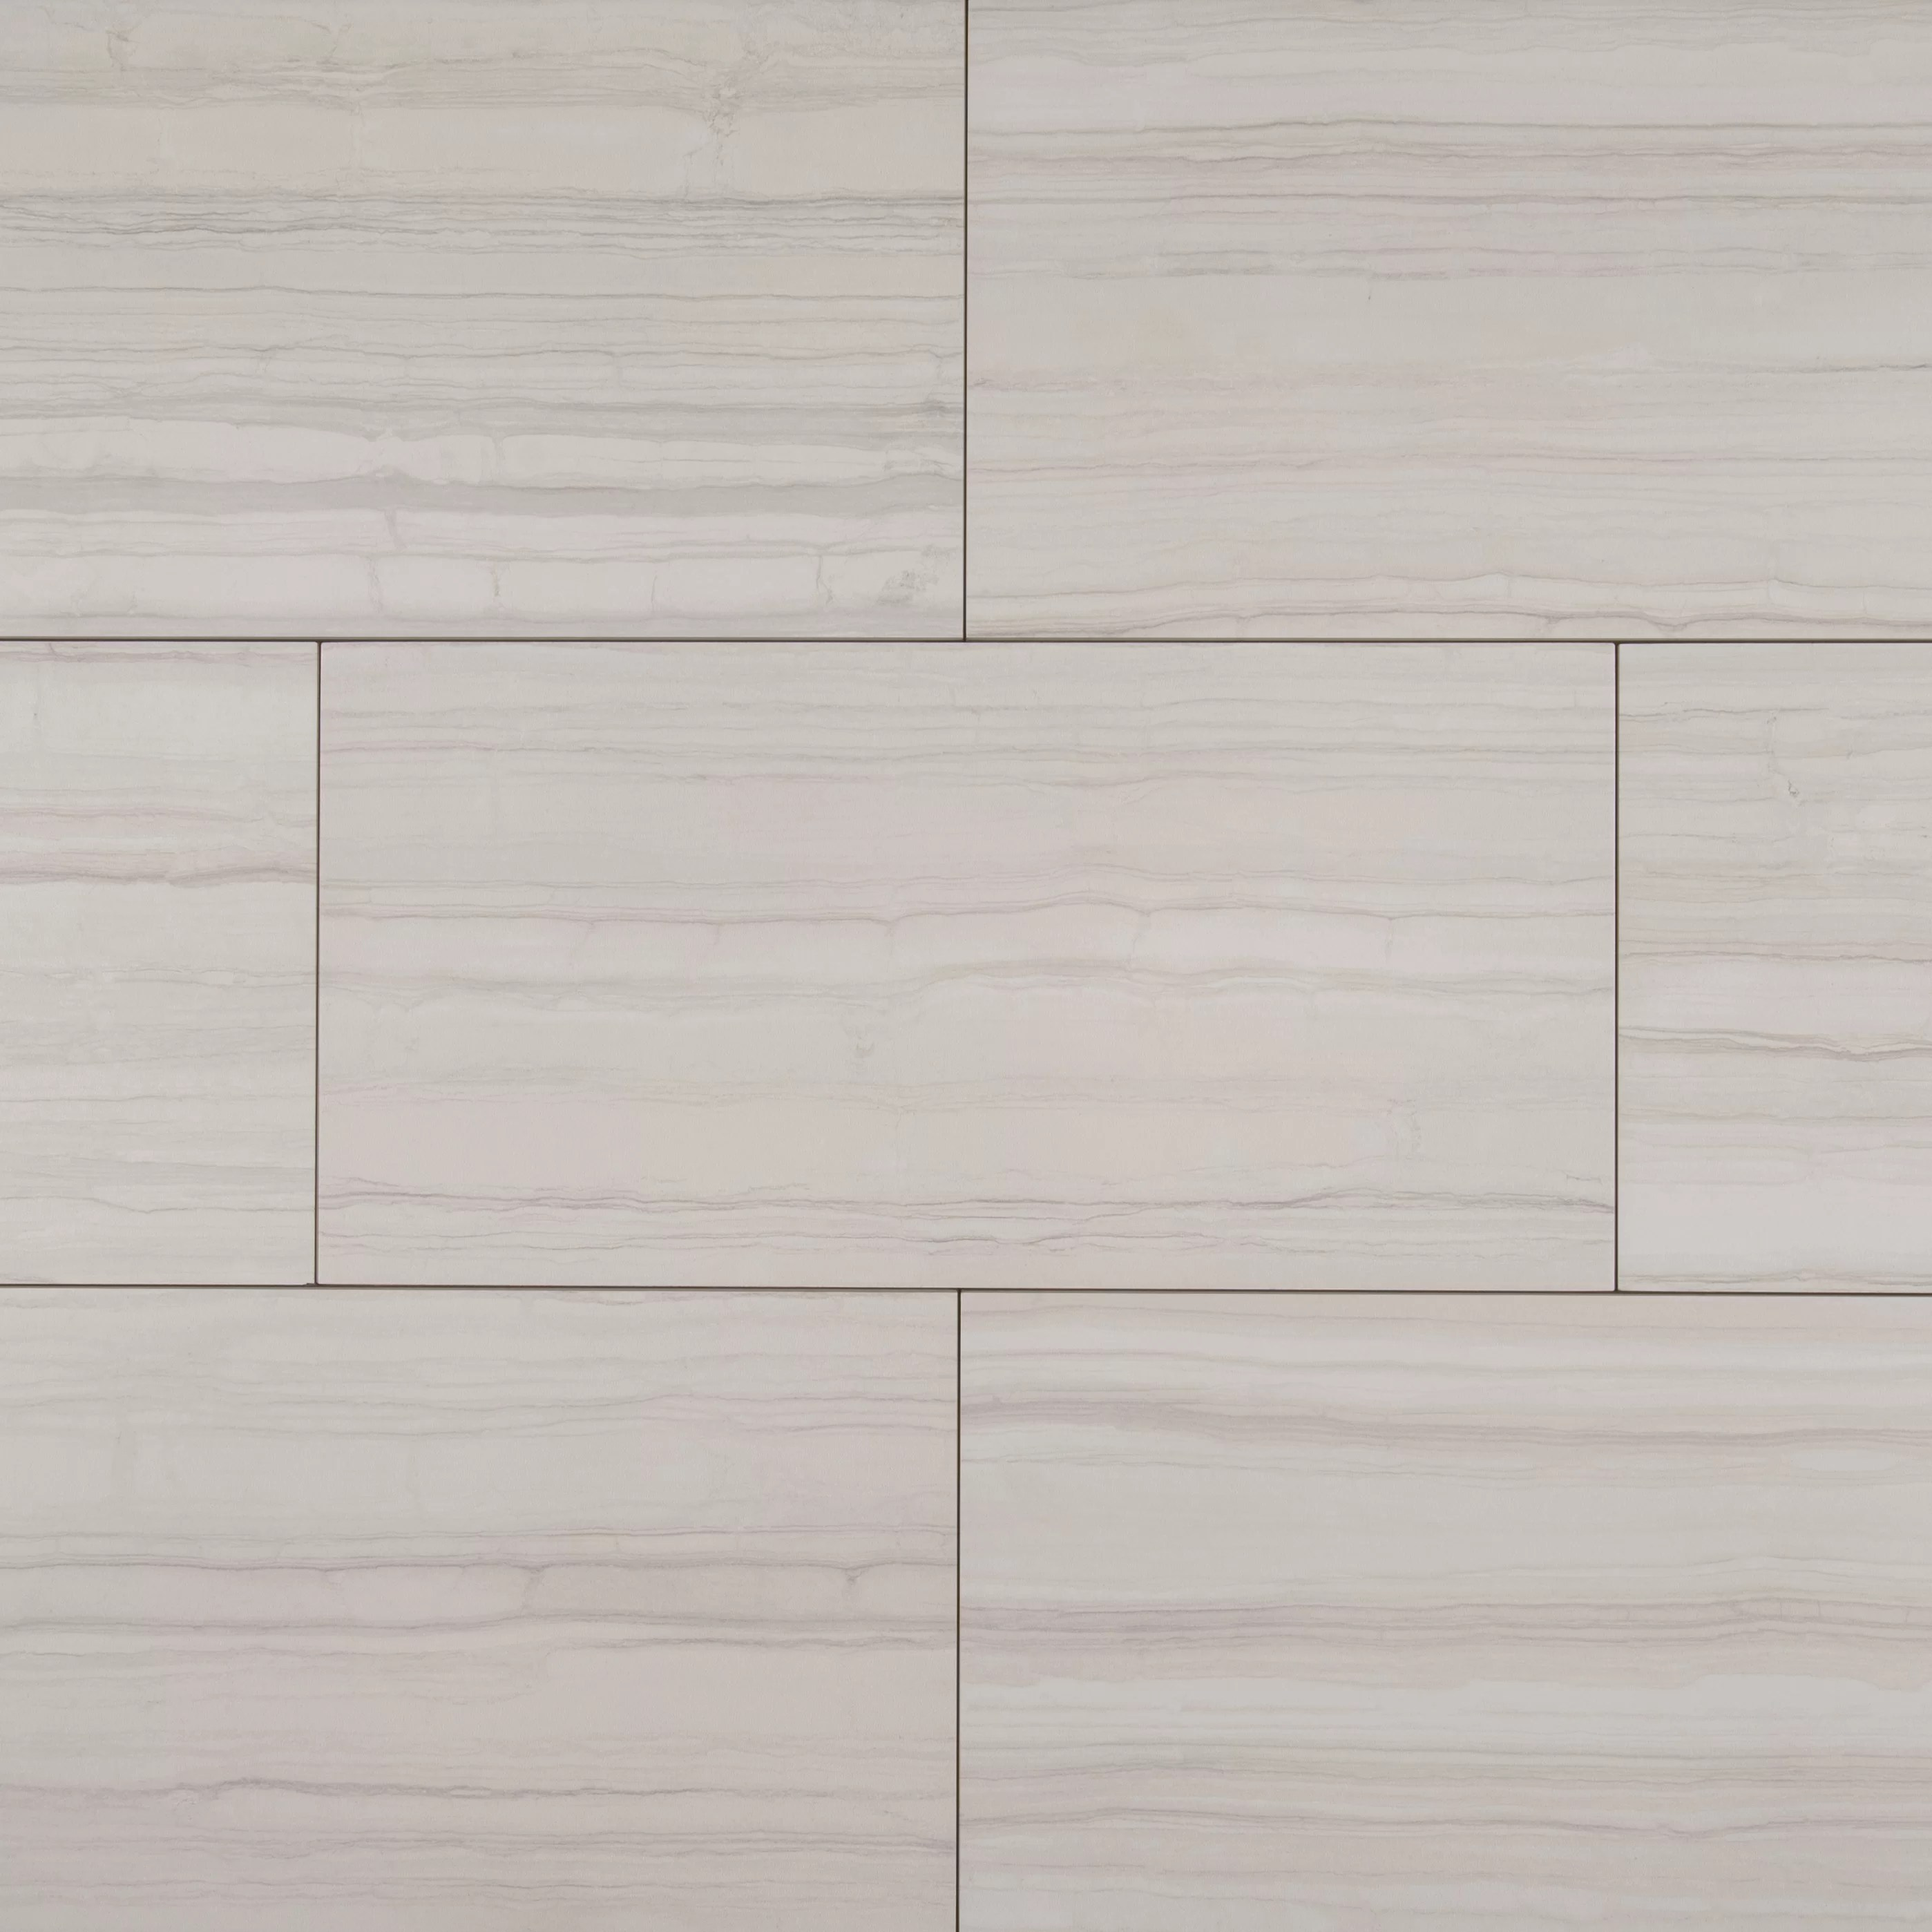 sophie 12 x 24 porcelain wood look tile in white